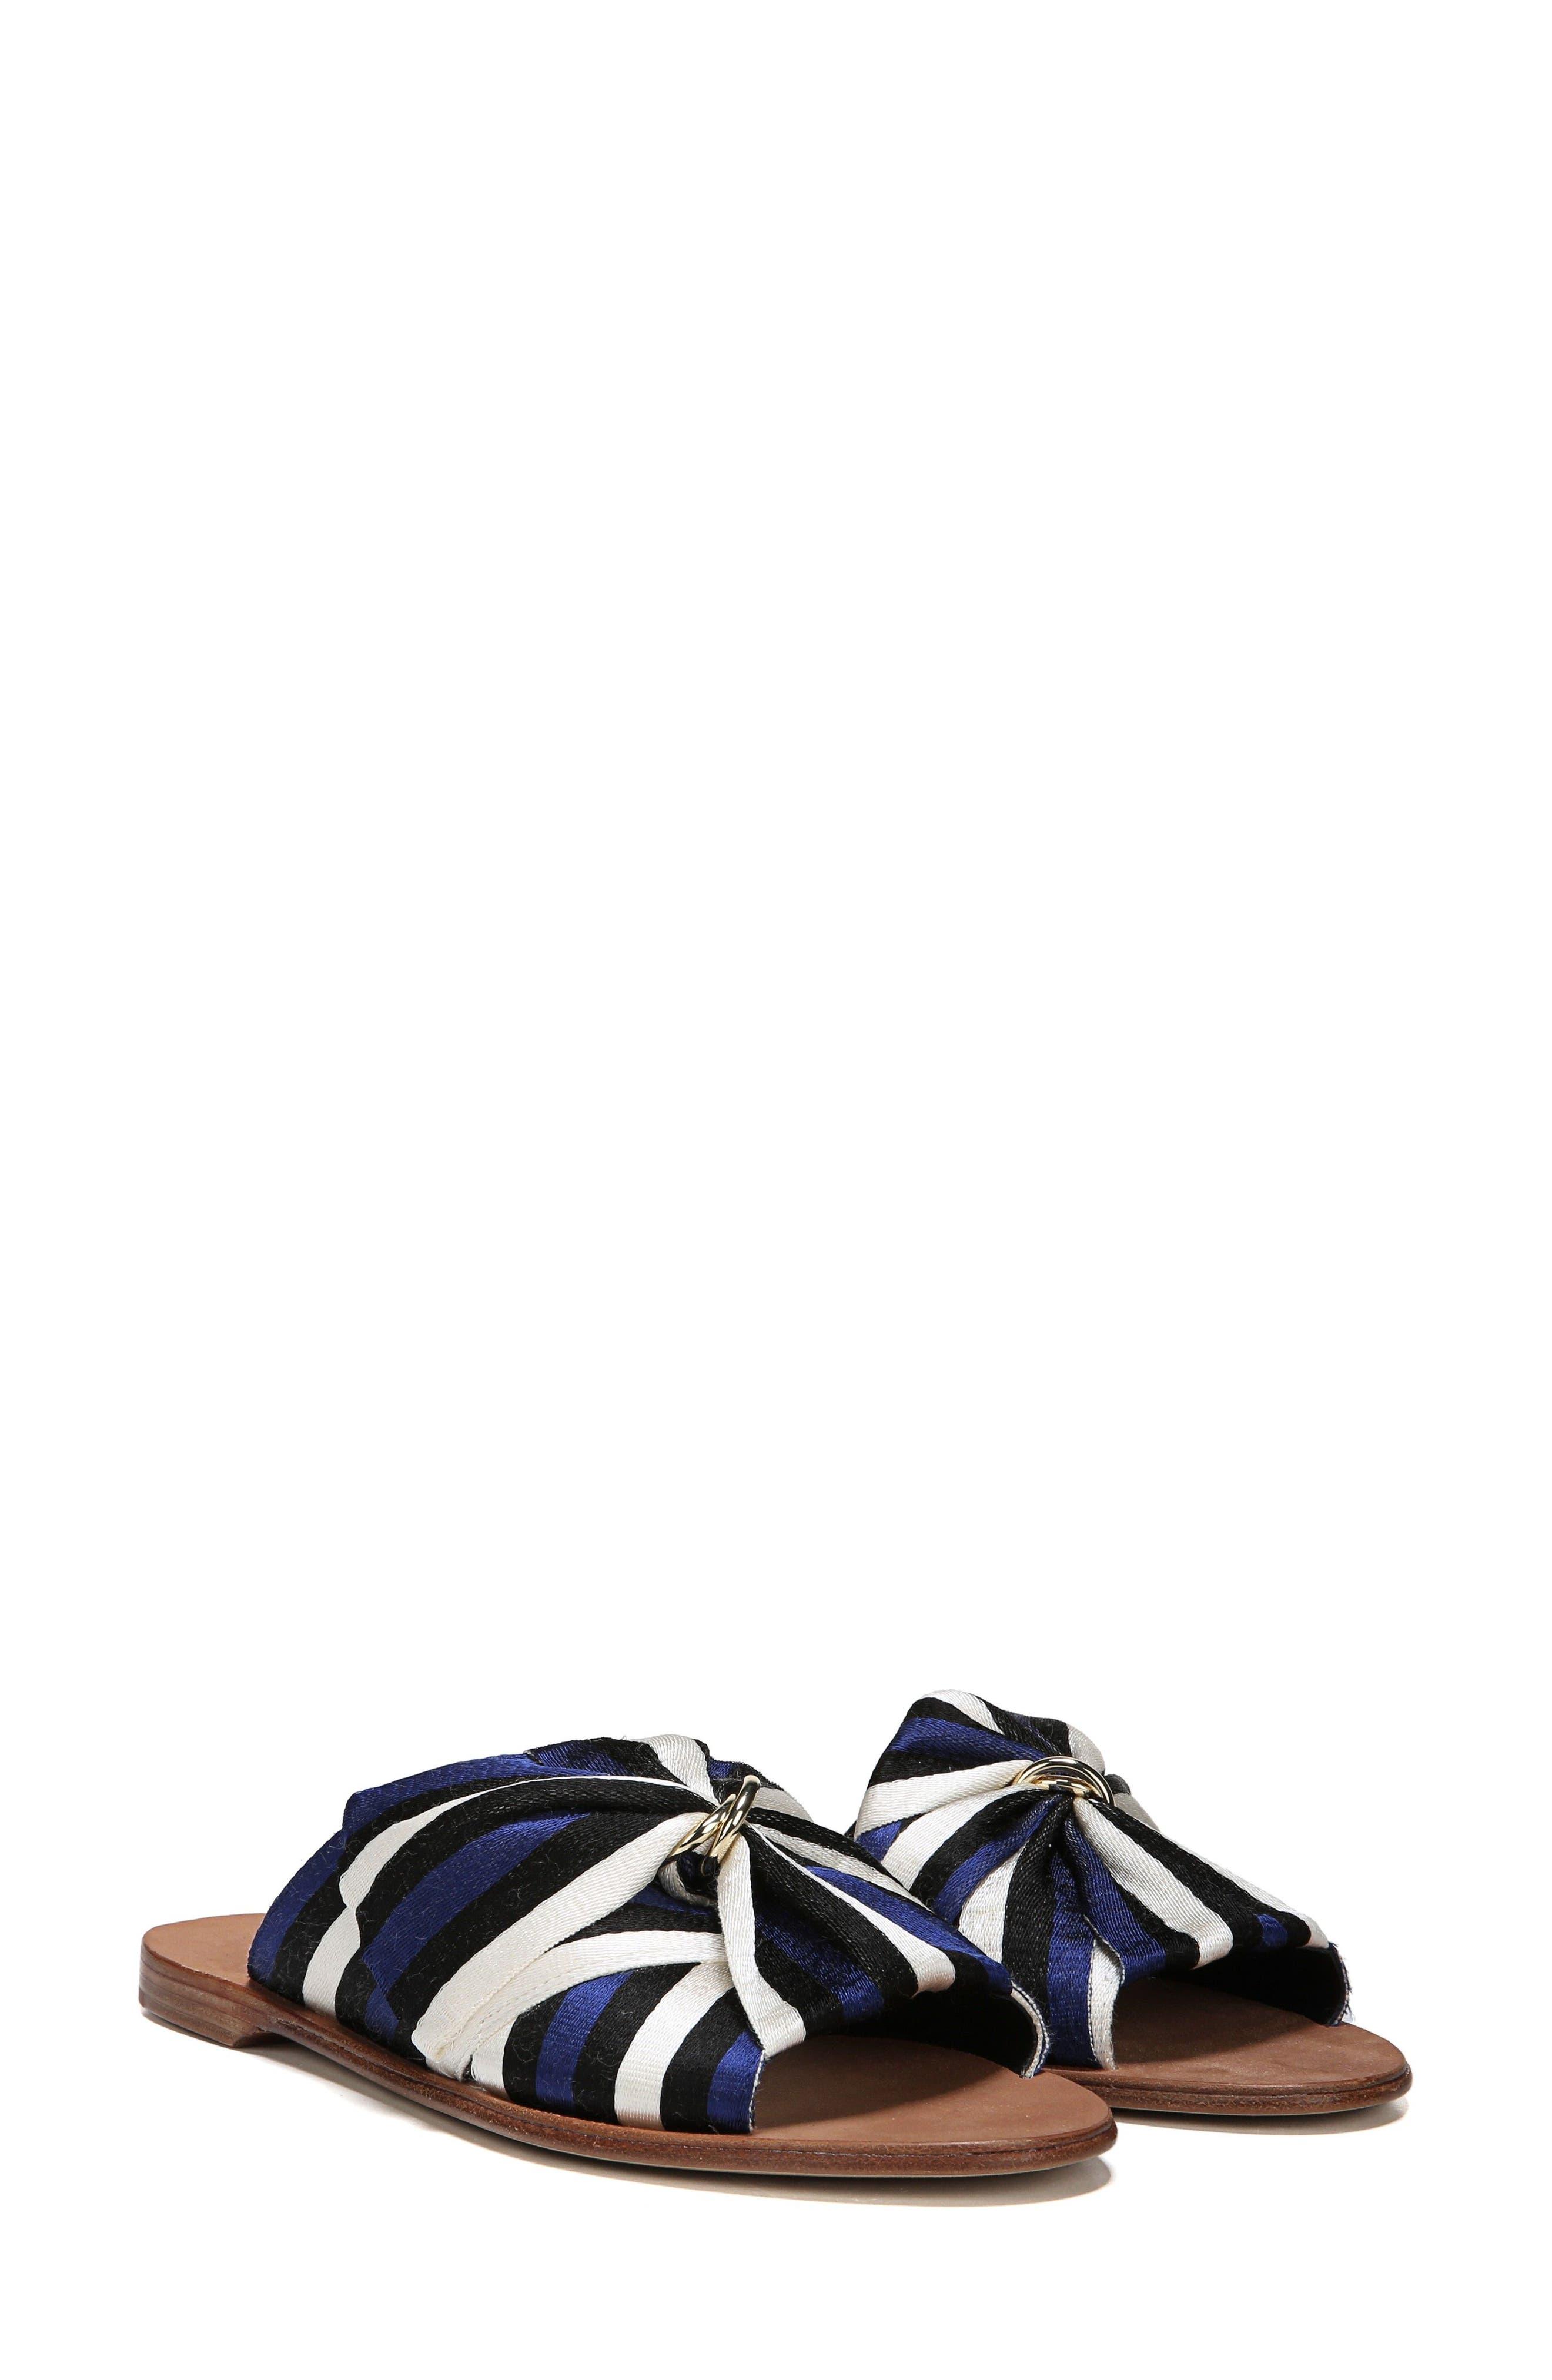 Bella Asymmetrical Slide Sandal,                             Alternate thumbnail 13, color,